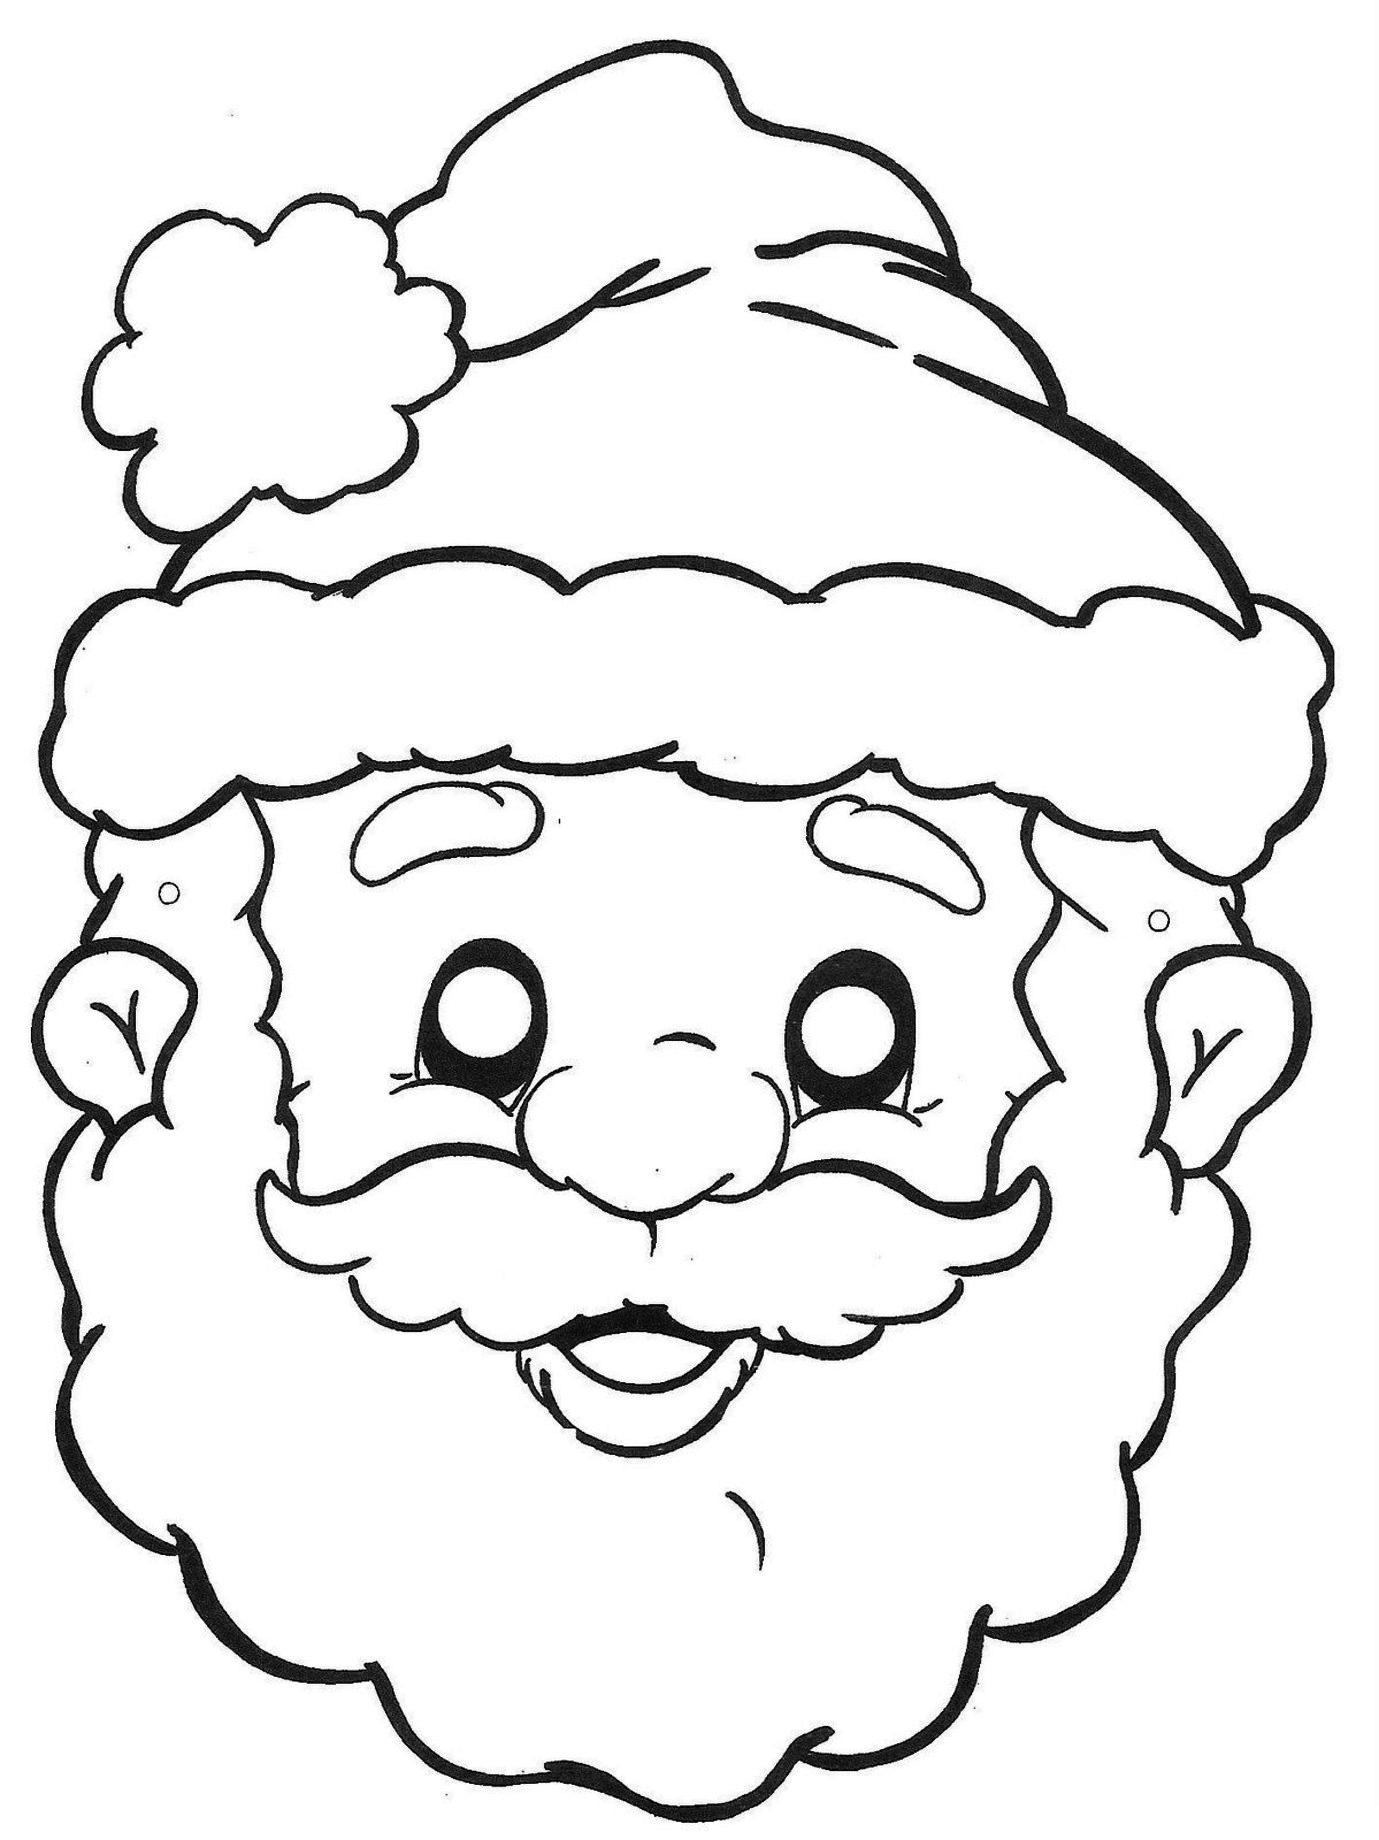 Дед мороз картинки для раскрашивания лицо ханг